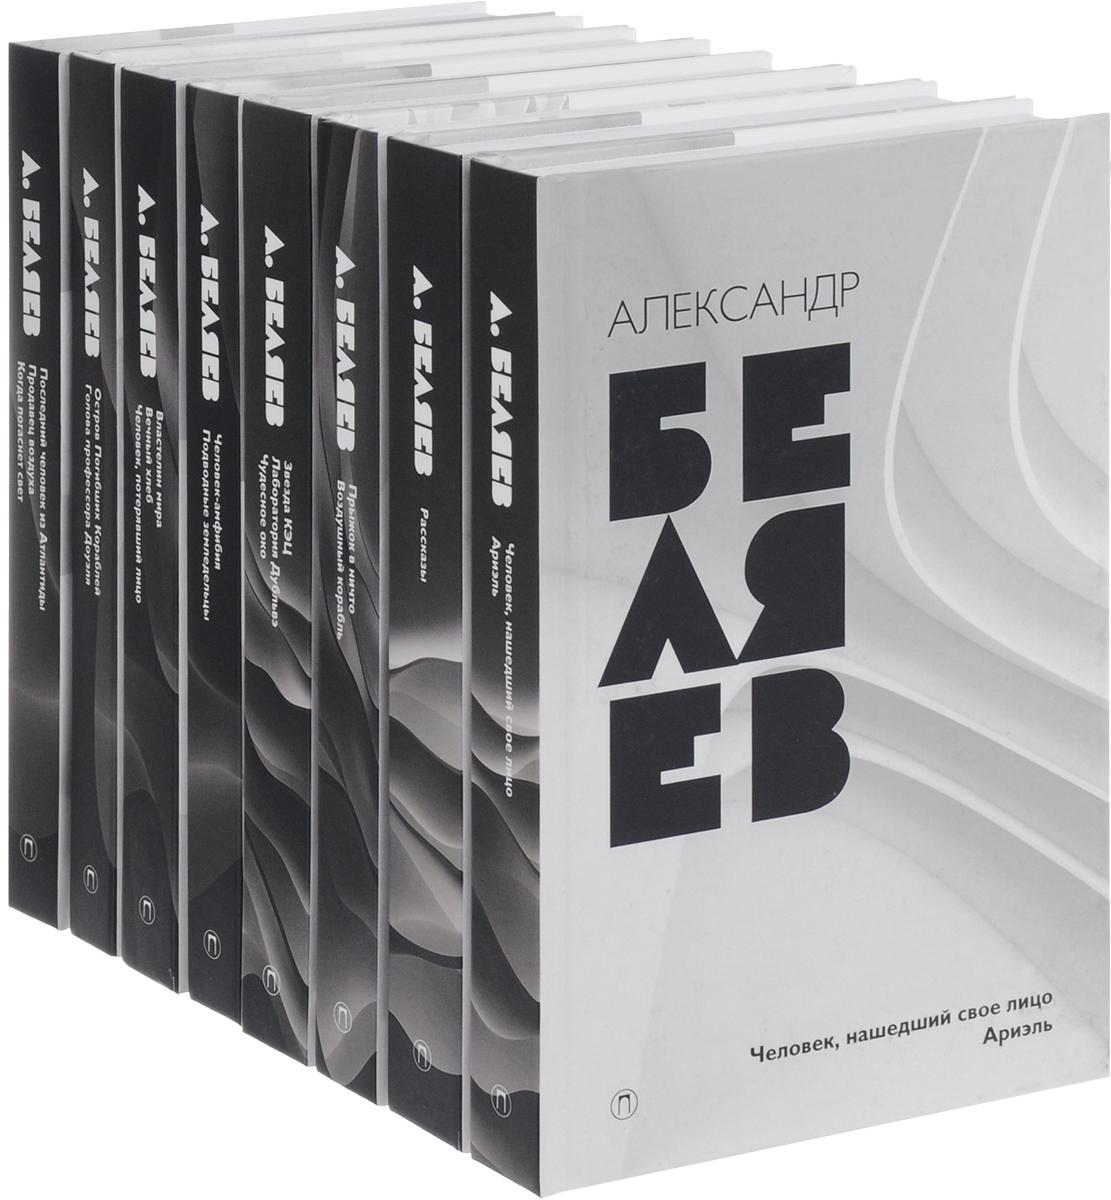 Александр Беляев Александр Беляев. Собрание сочинений (комплект из 8 книг) кружка printio рыбки